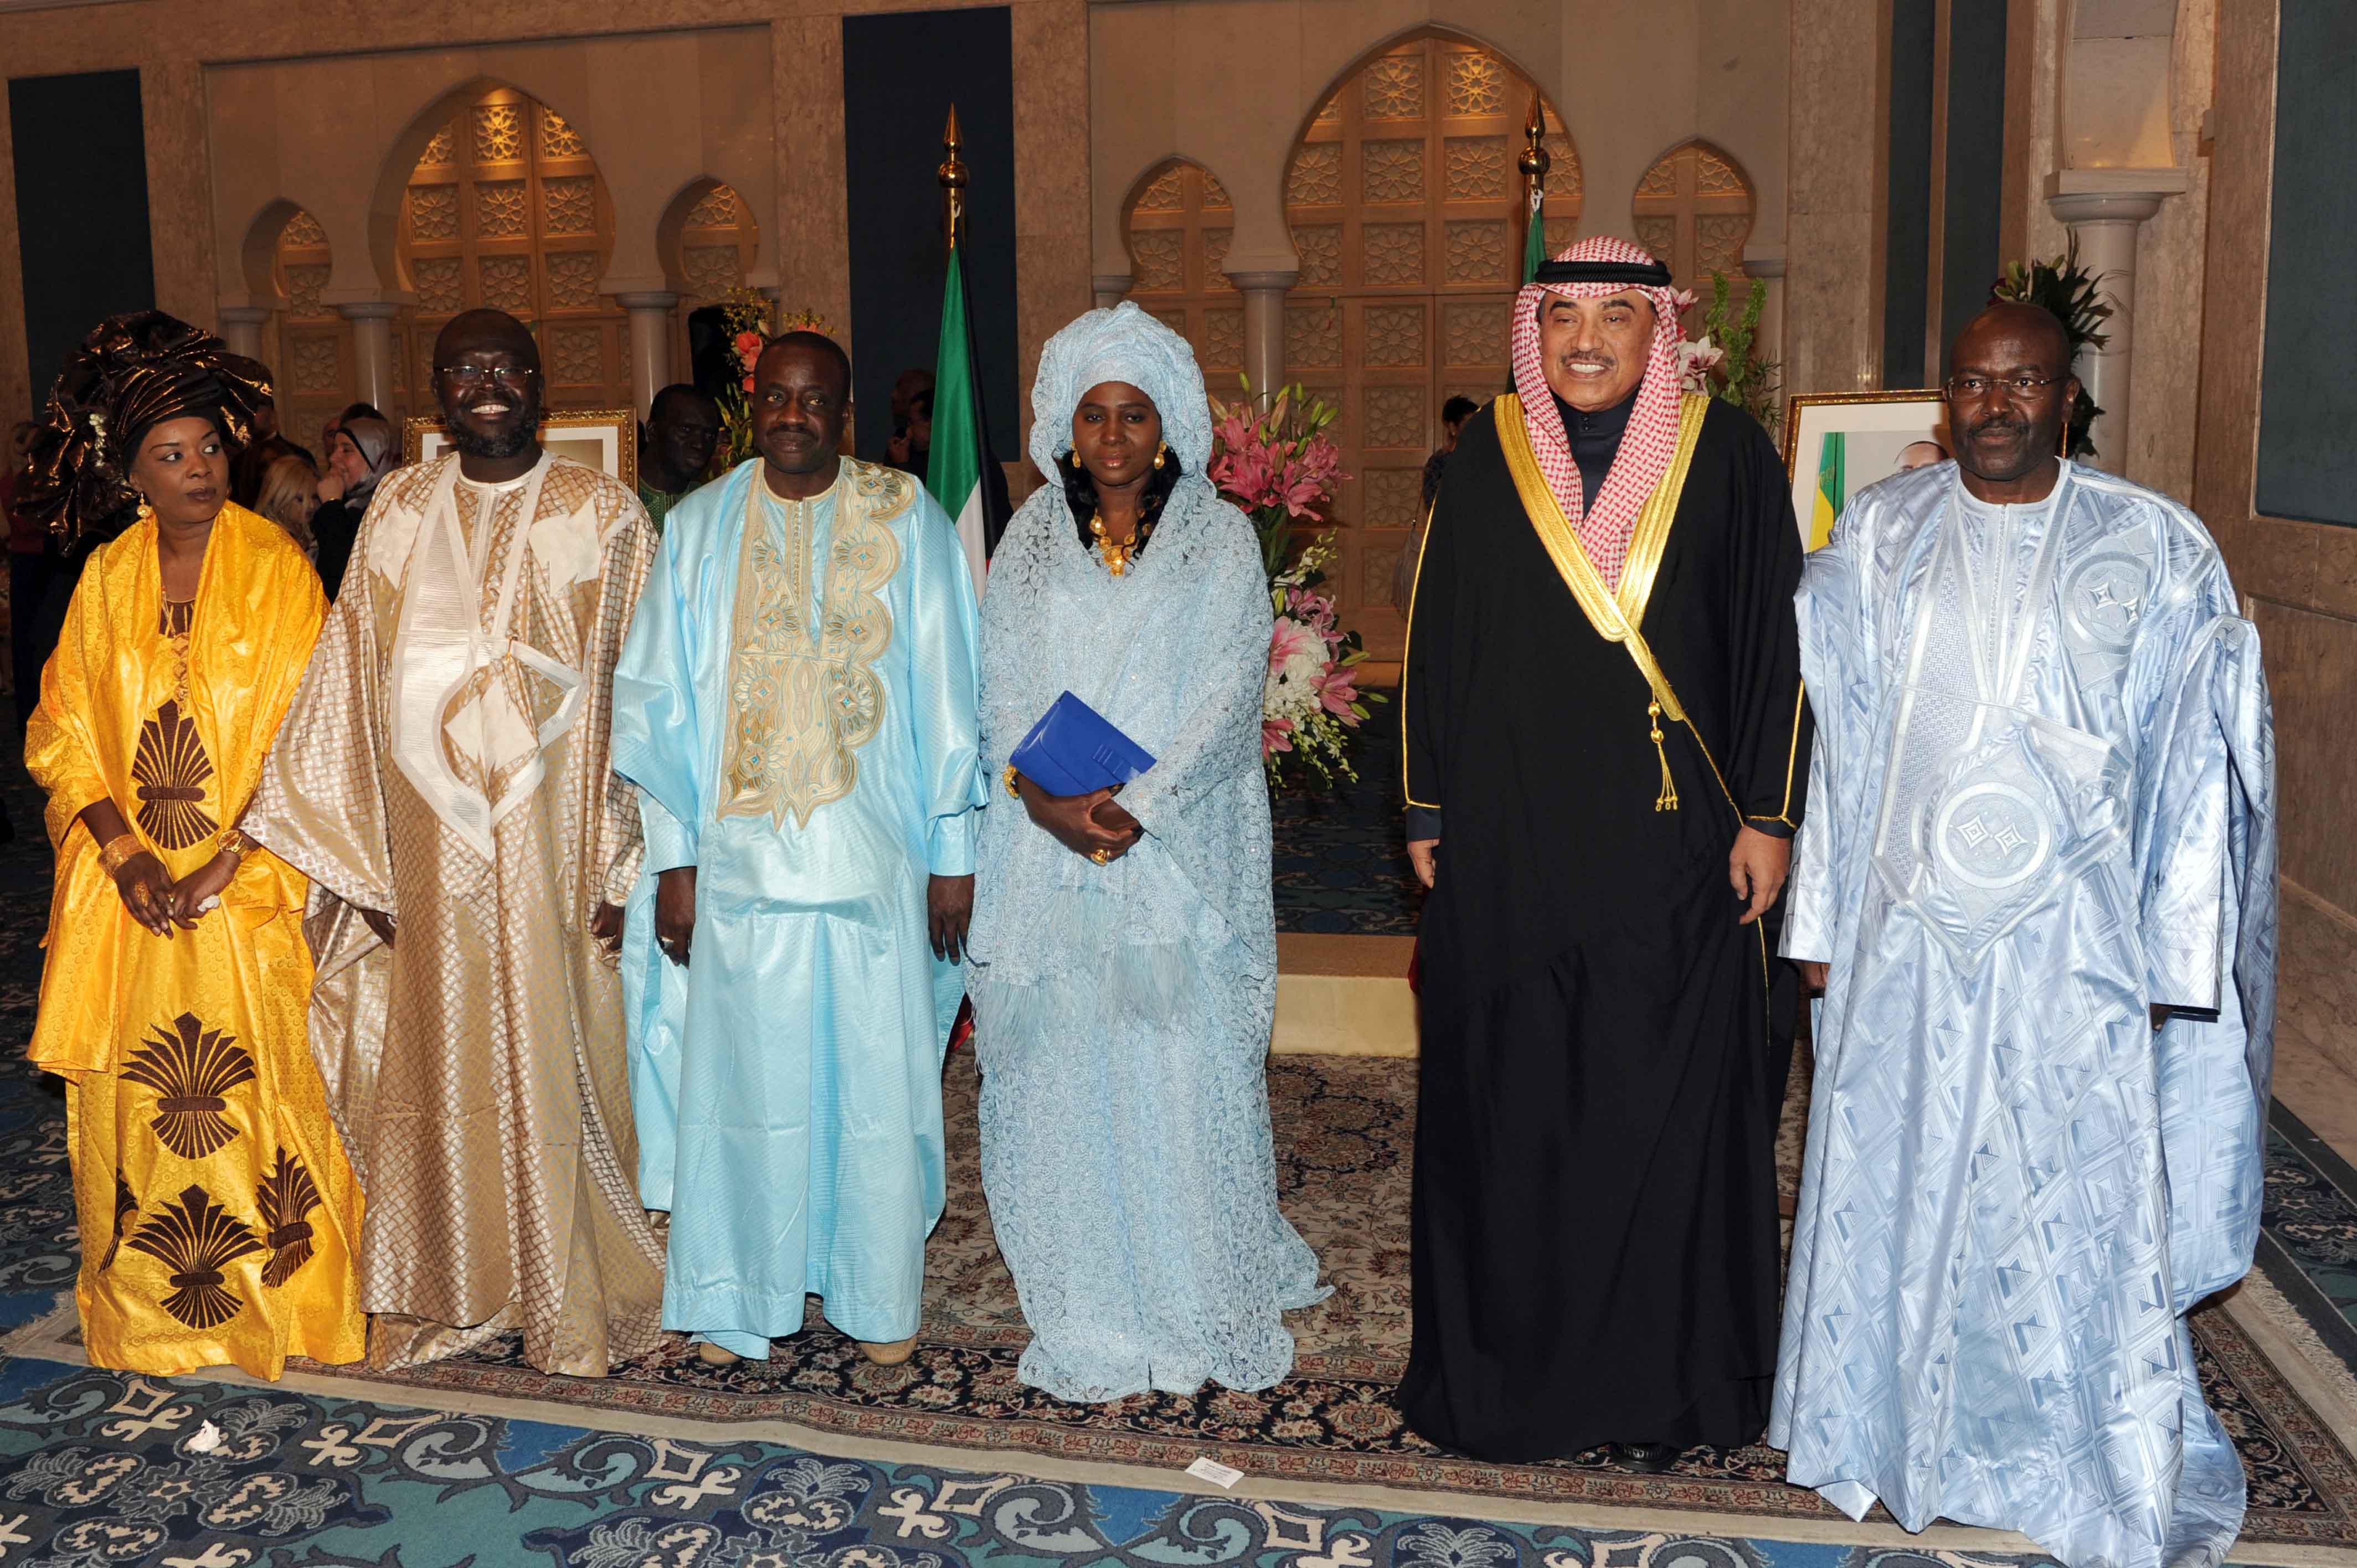 KUNA : Kuwait FM hails strong ties with Senegal - Politics